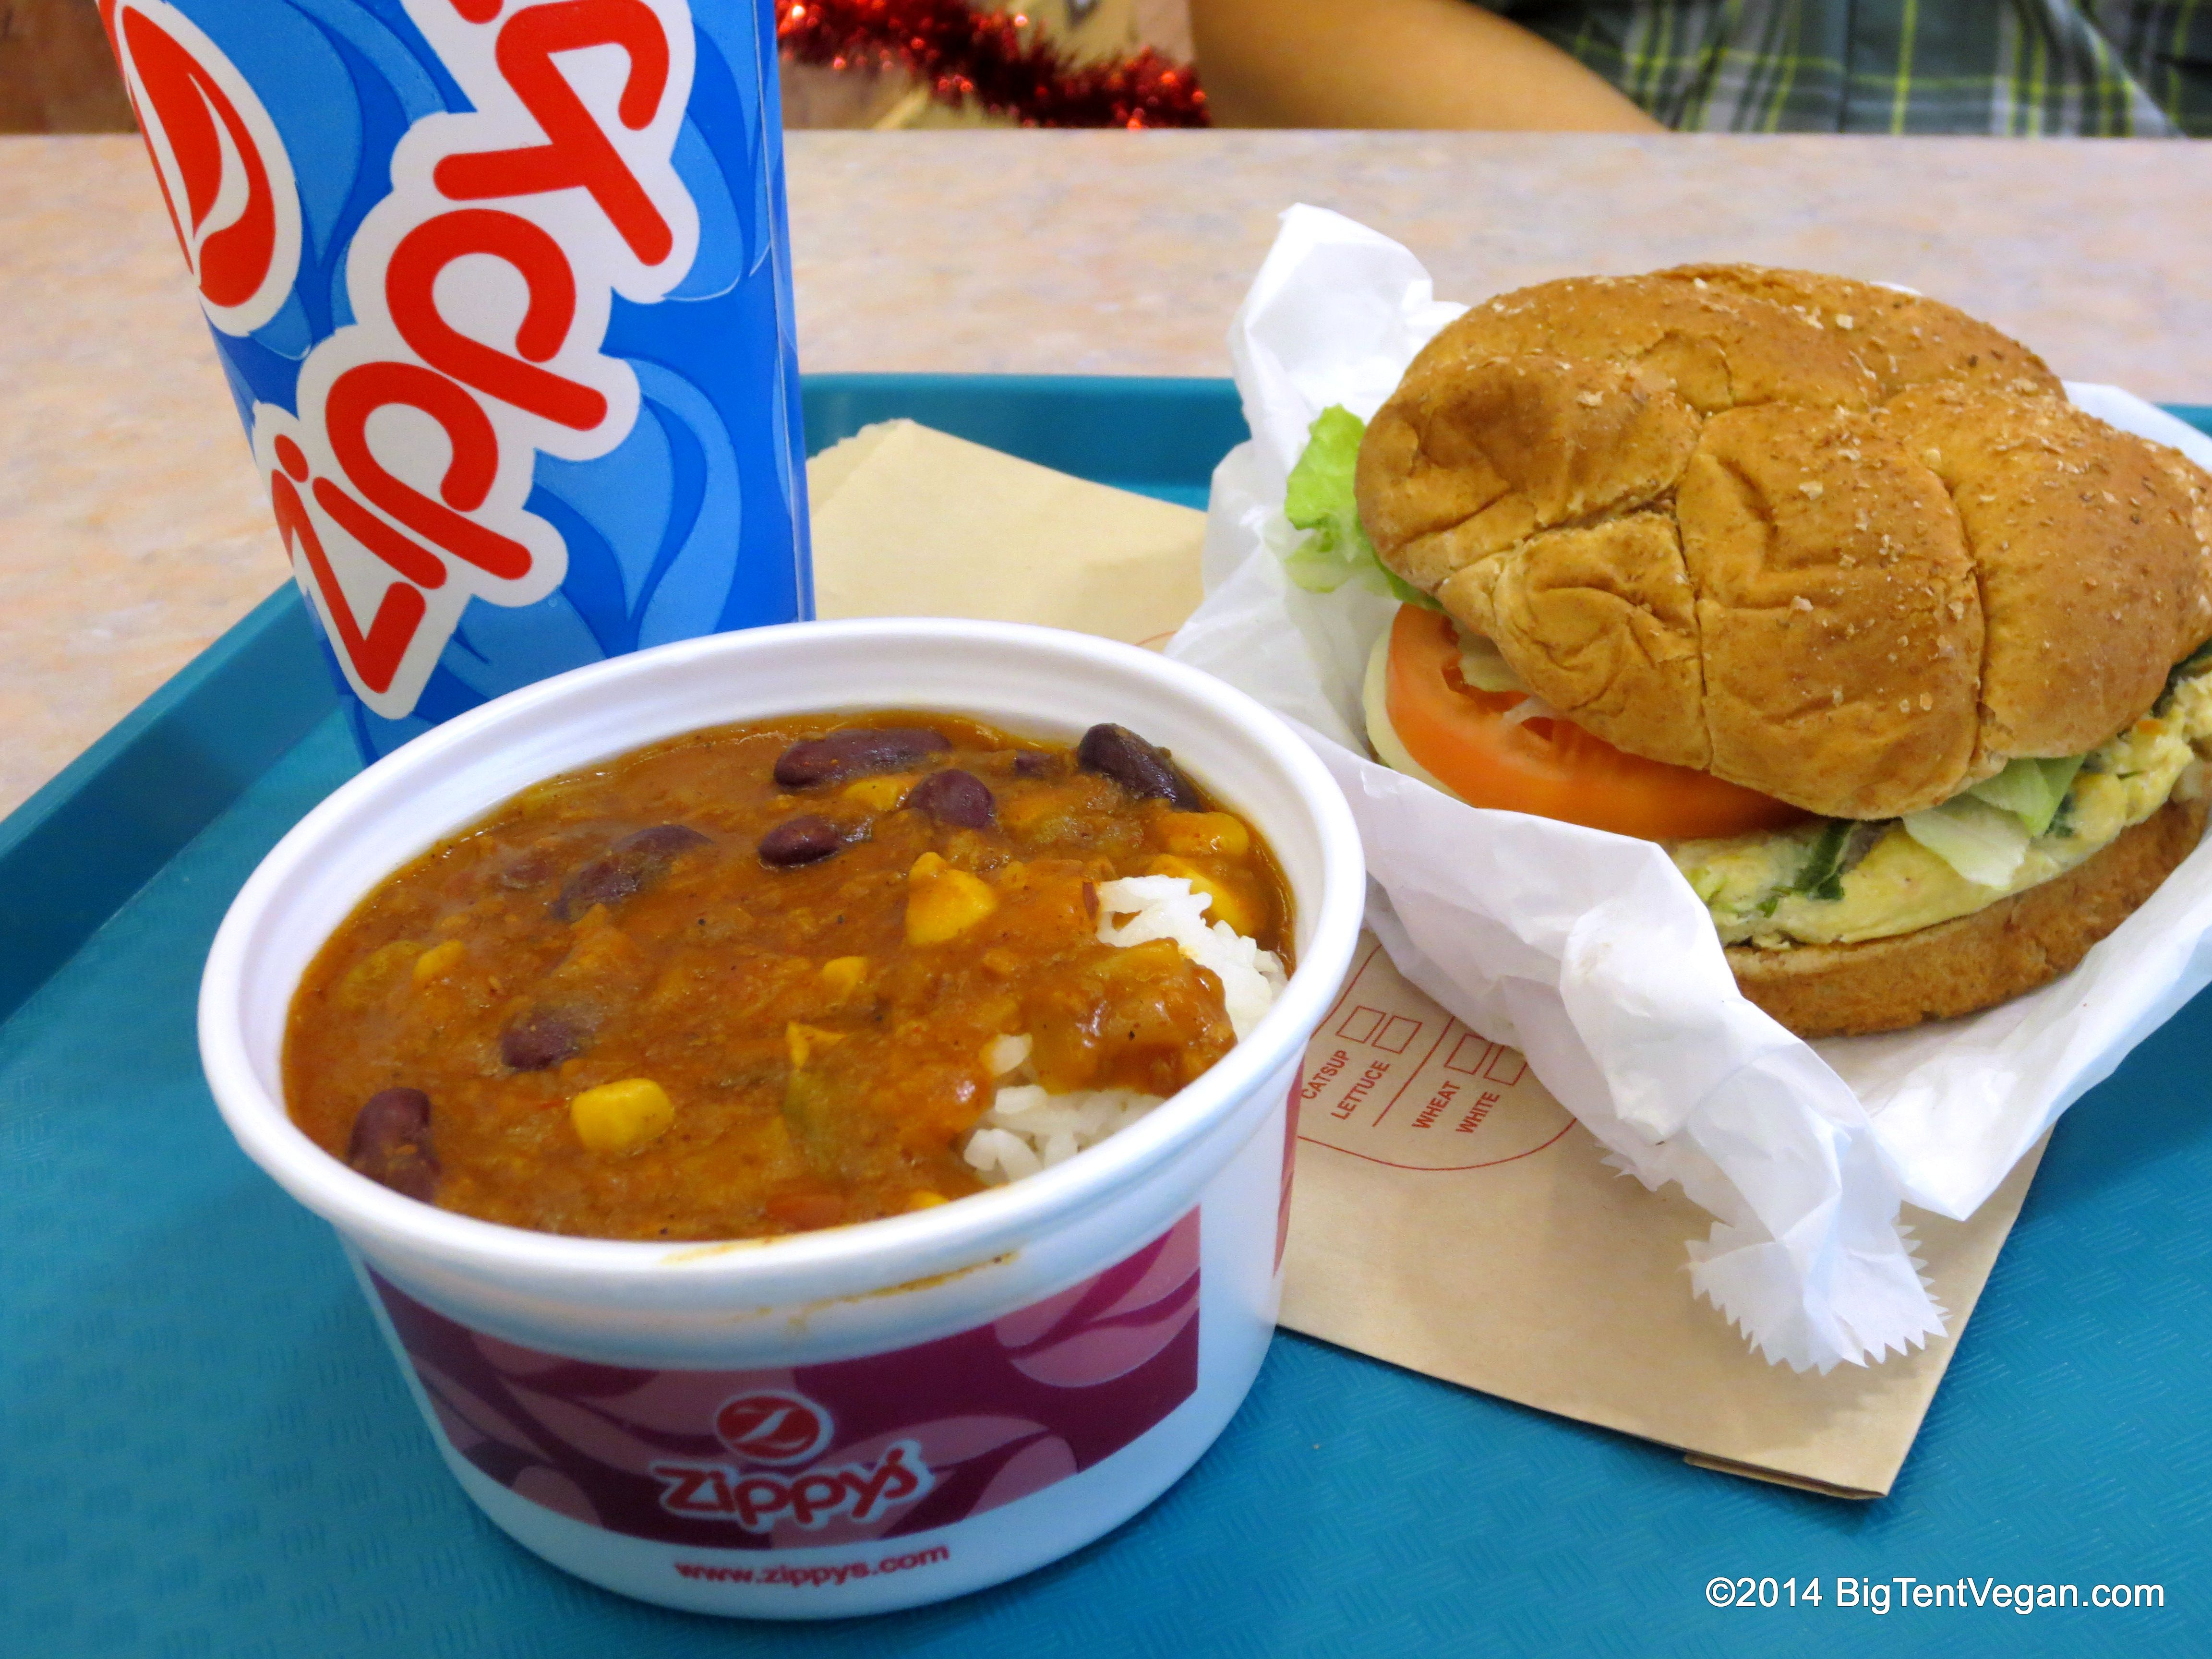 Vegetarian Vegan Chili With Rice Vegi Tofu Burger Request No Mayo Everywhere Oahu Hi Vegan Tofu Burger Vegan Chili Vegetarian